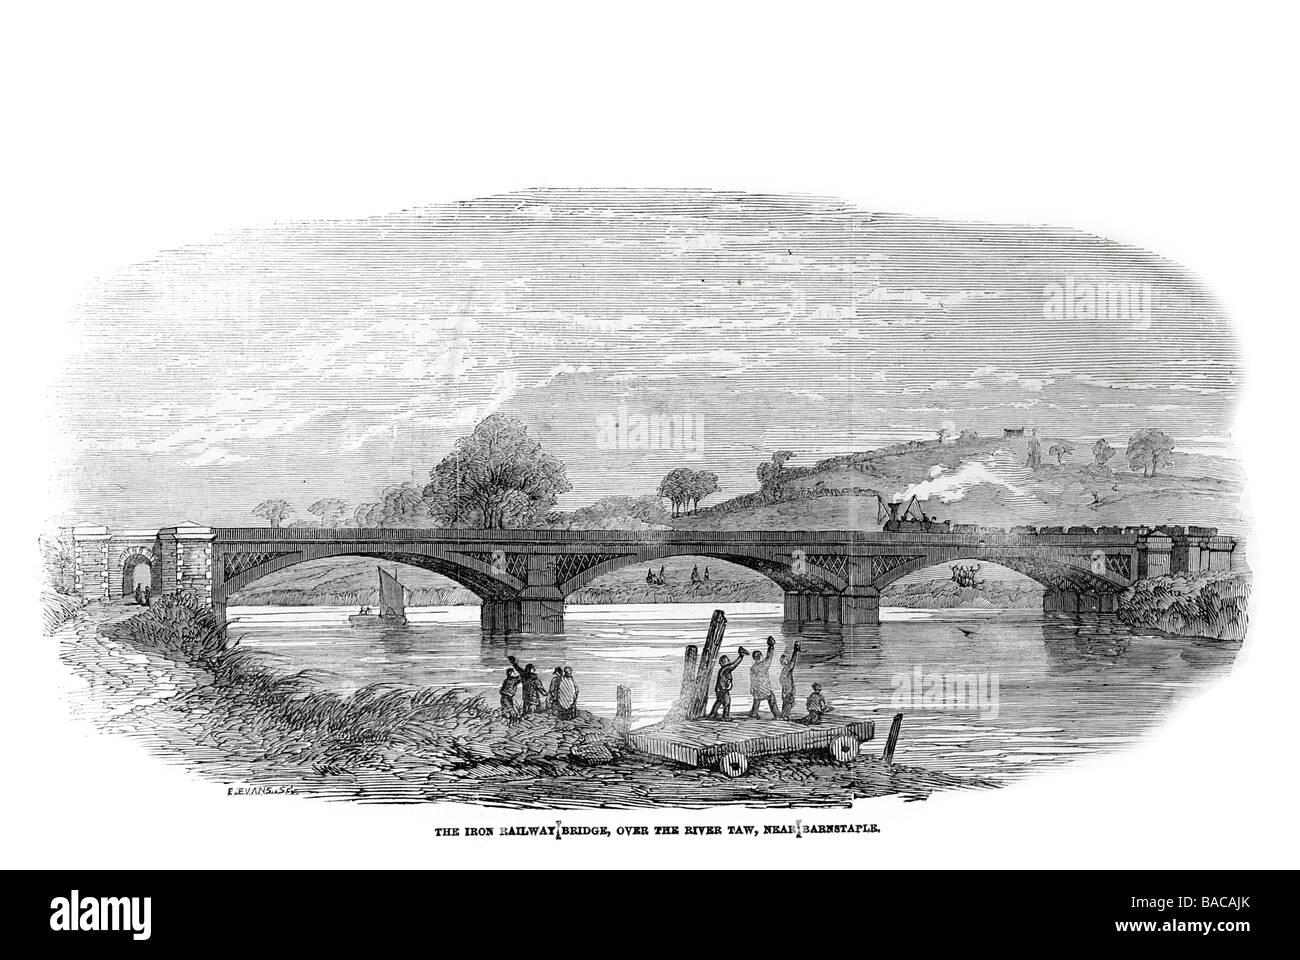 Iron Railway Bridge Over The River Taw Near Barnstaple Railway Stock Photo Alamy